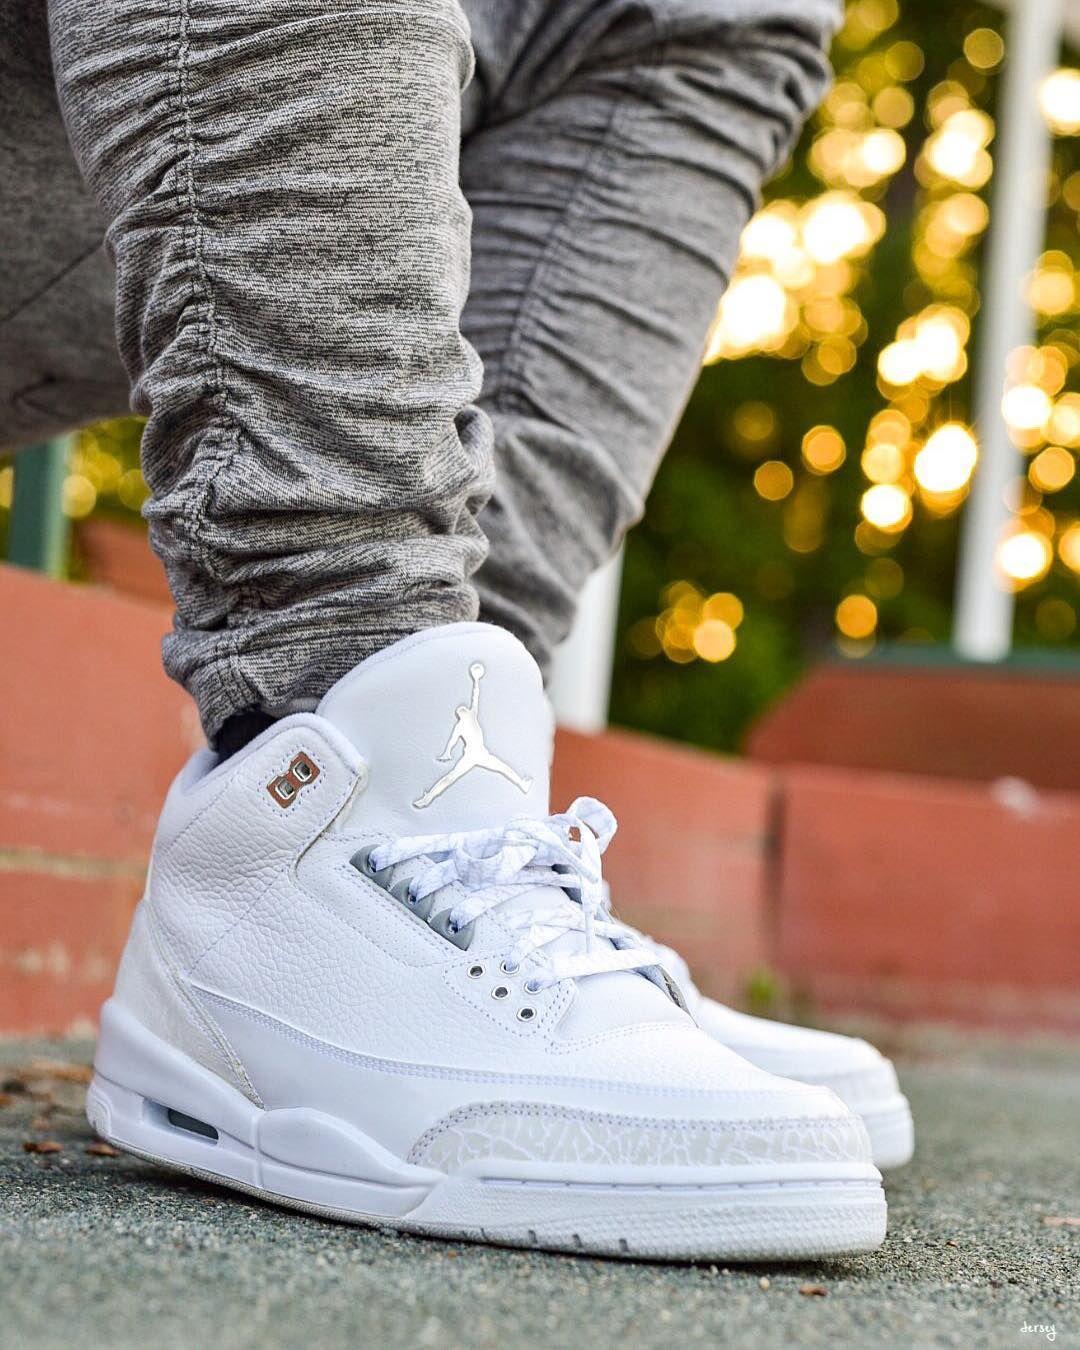 Air Jordan White | White sneakers men, White sneakers outfit, Swag ...